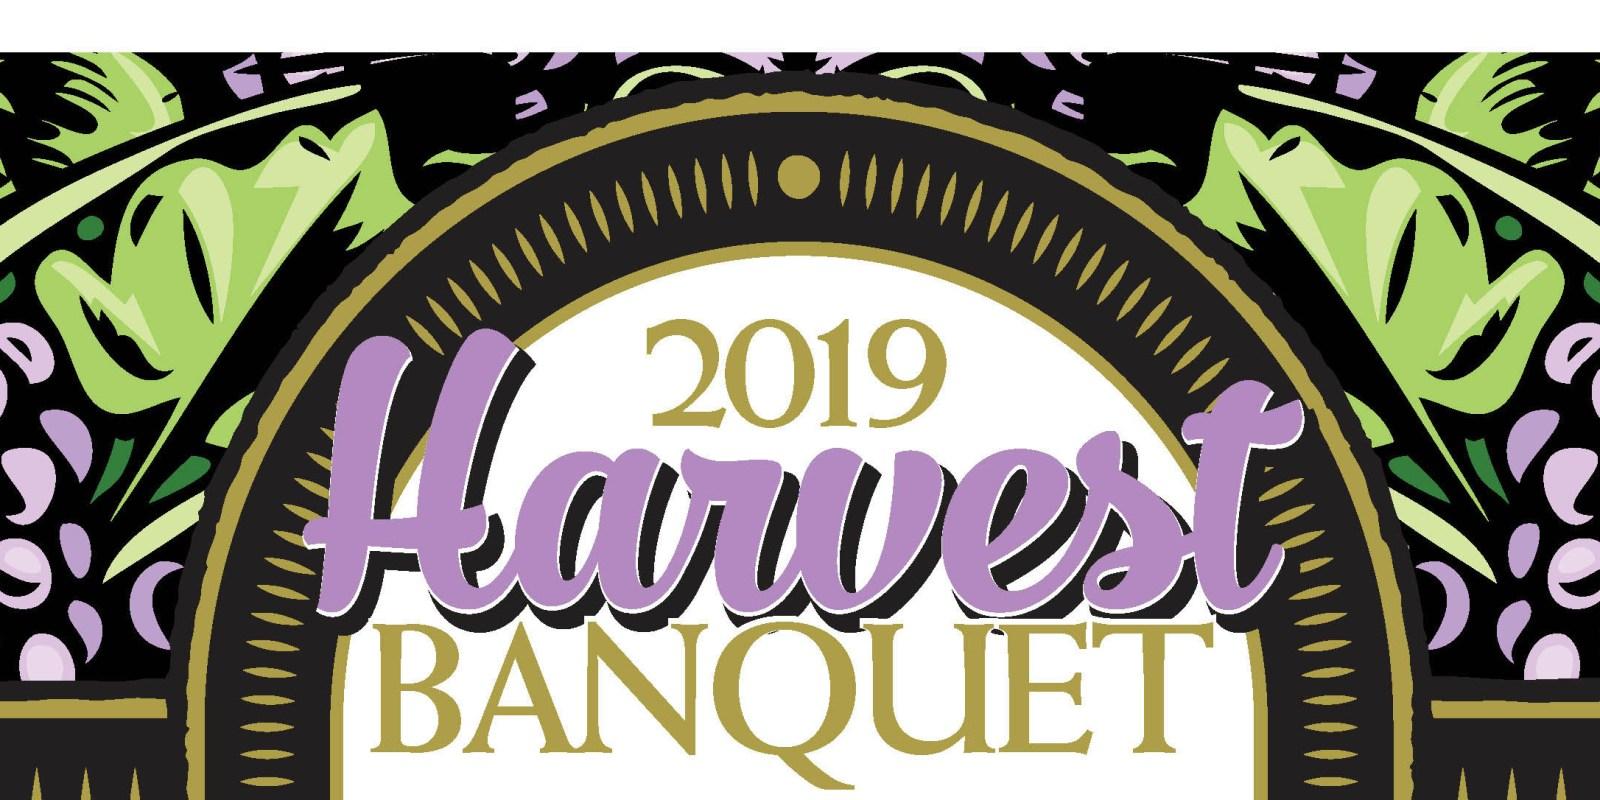 Harvest Banquet, Saturday October 19